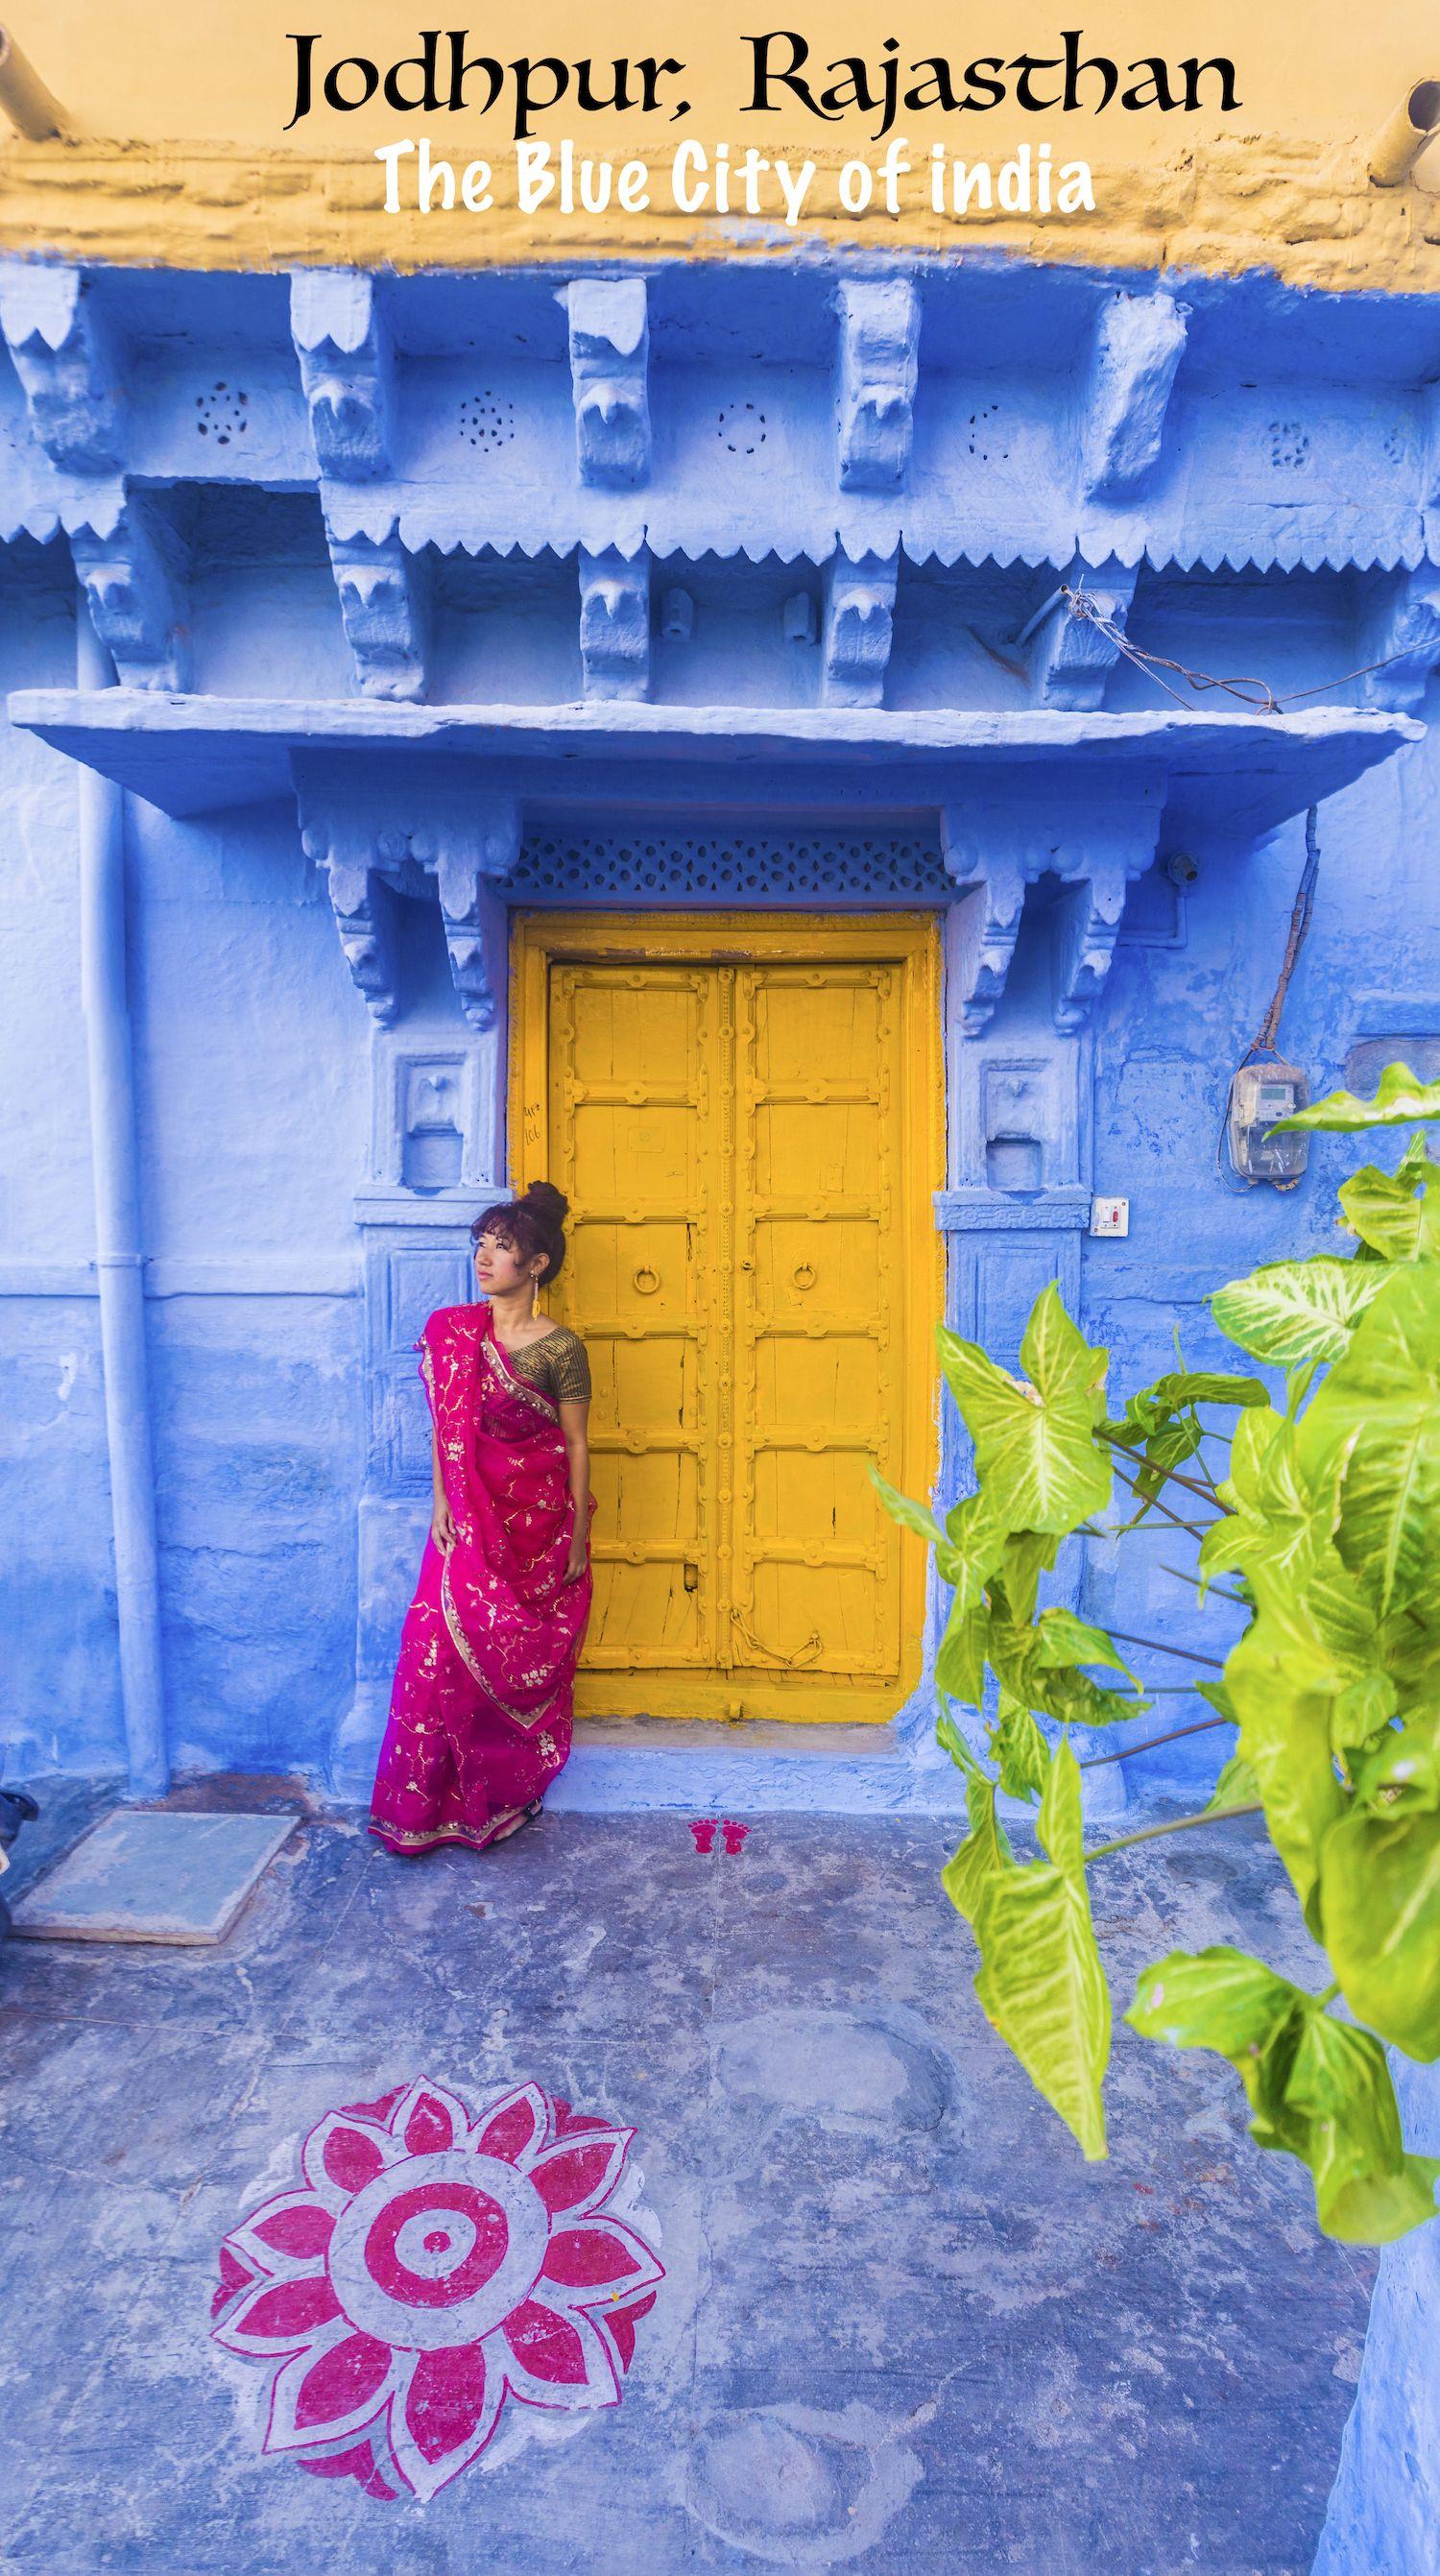 Blue city Jodhpur, Rajasthan, India twobirdsbreakingfree